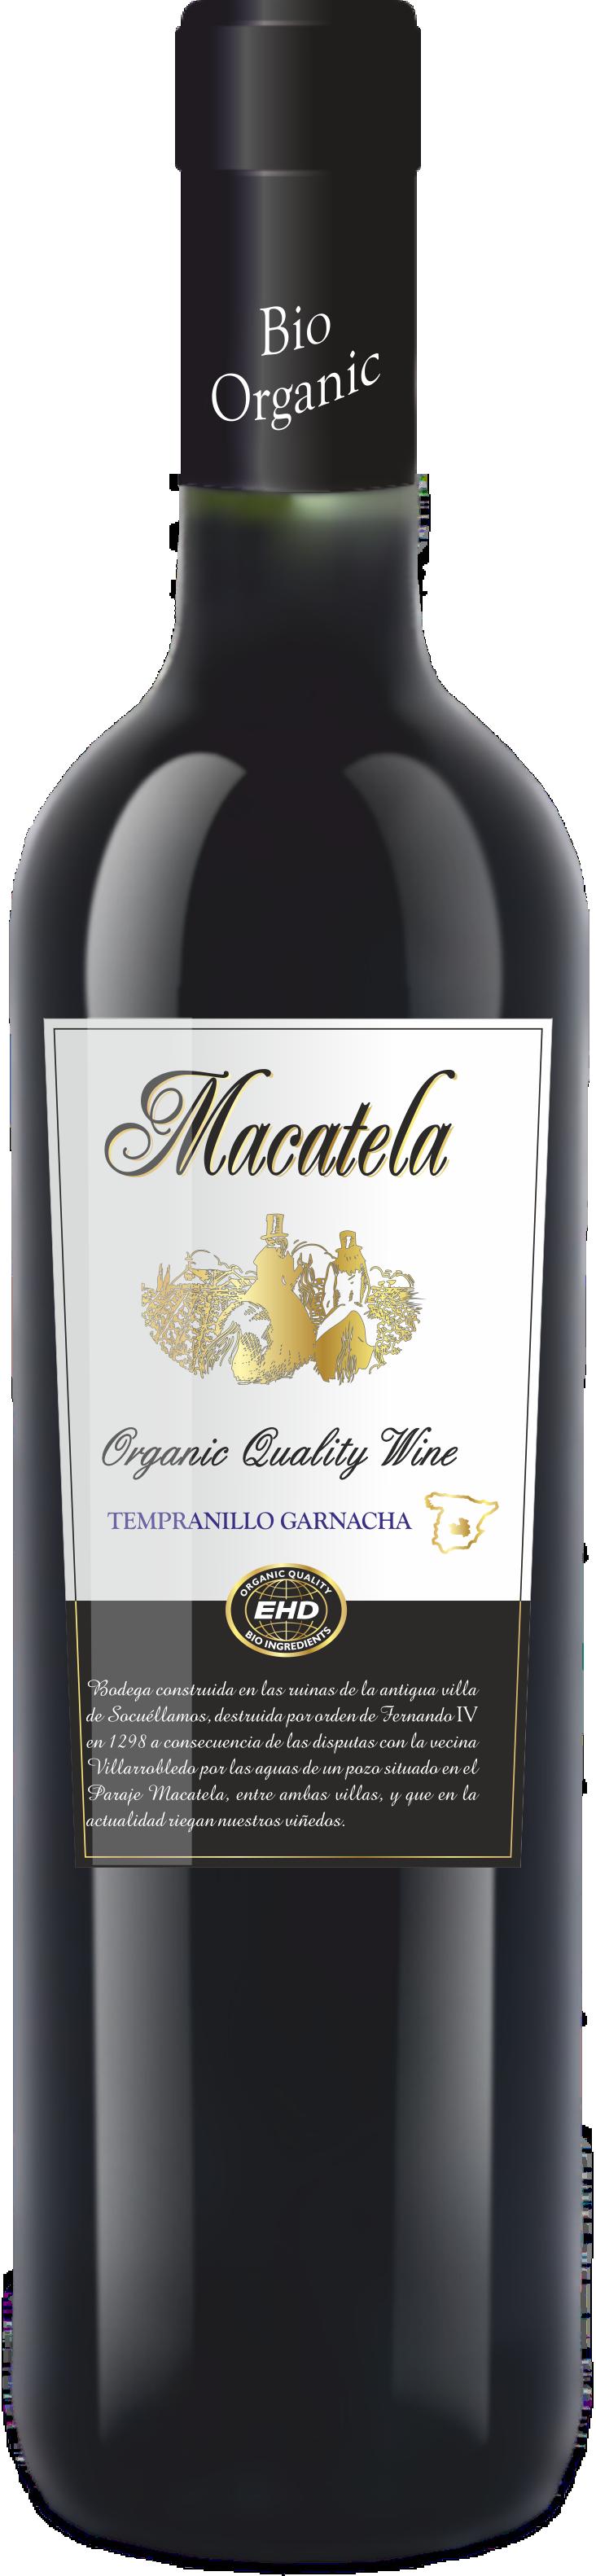 Macatela Temp. Garn. 75 CL